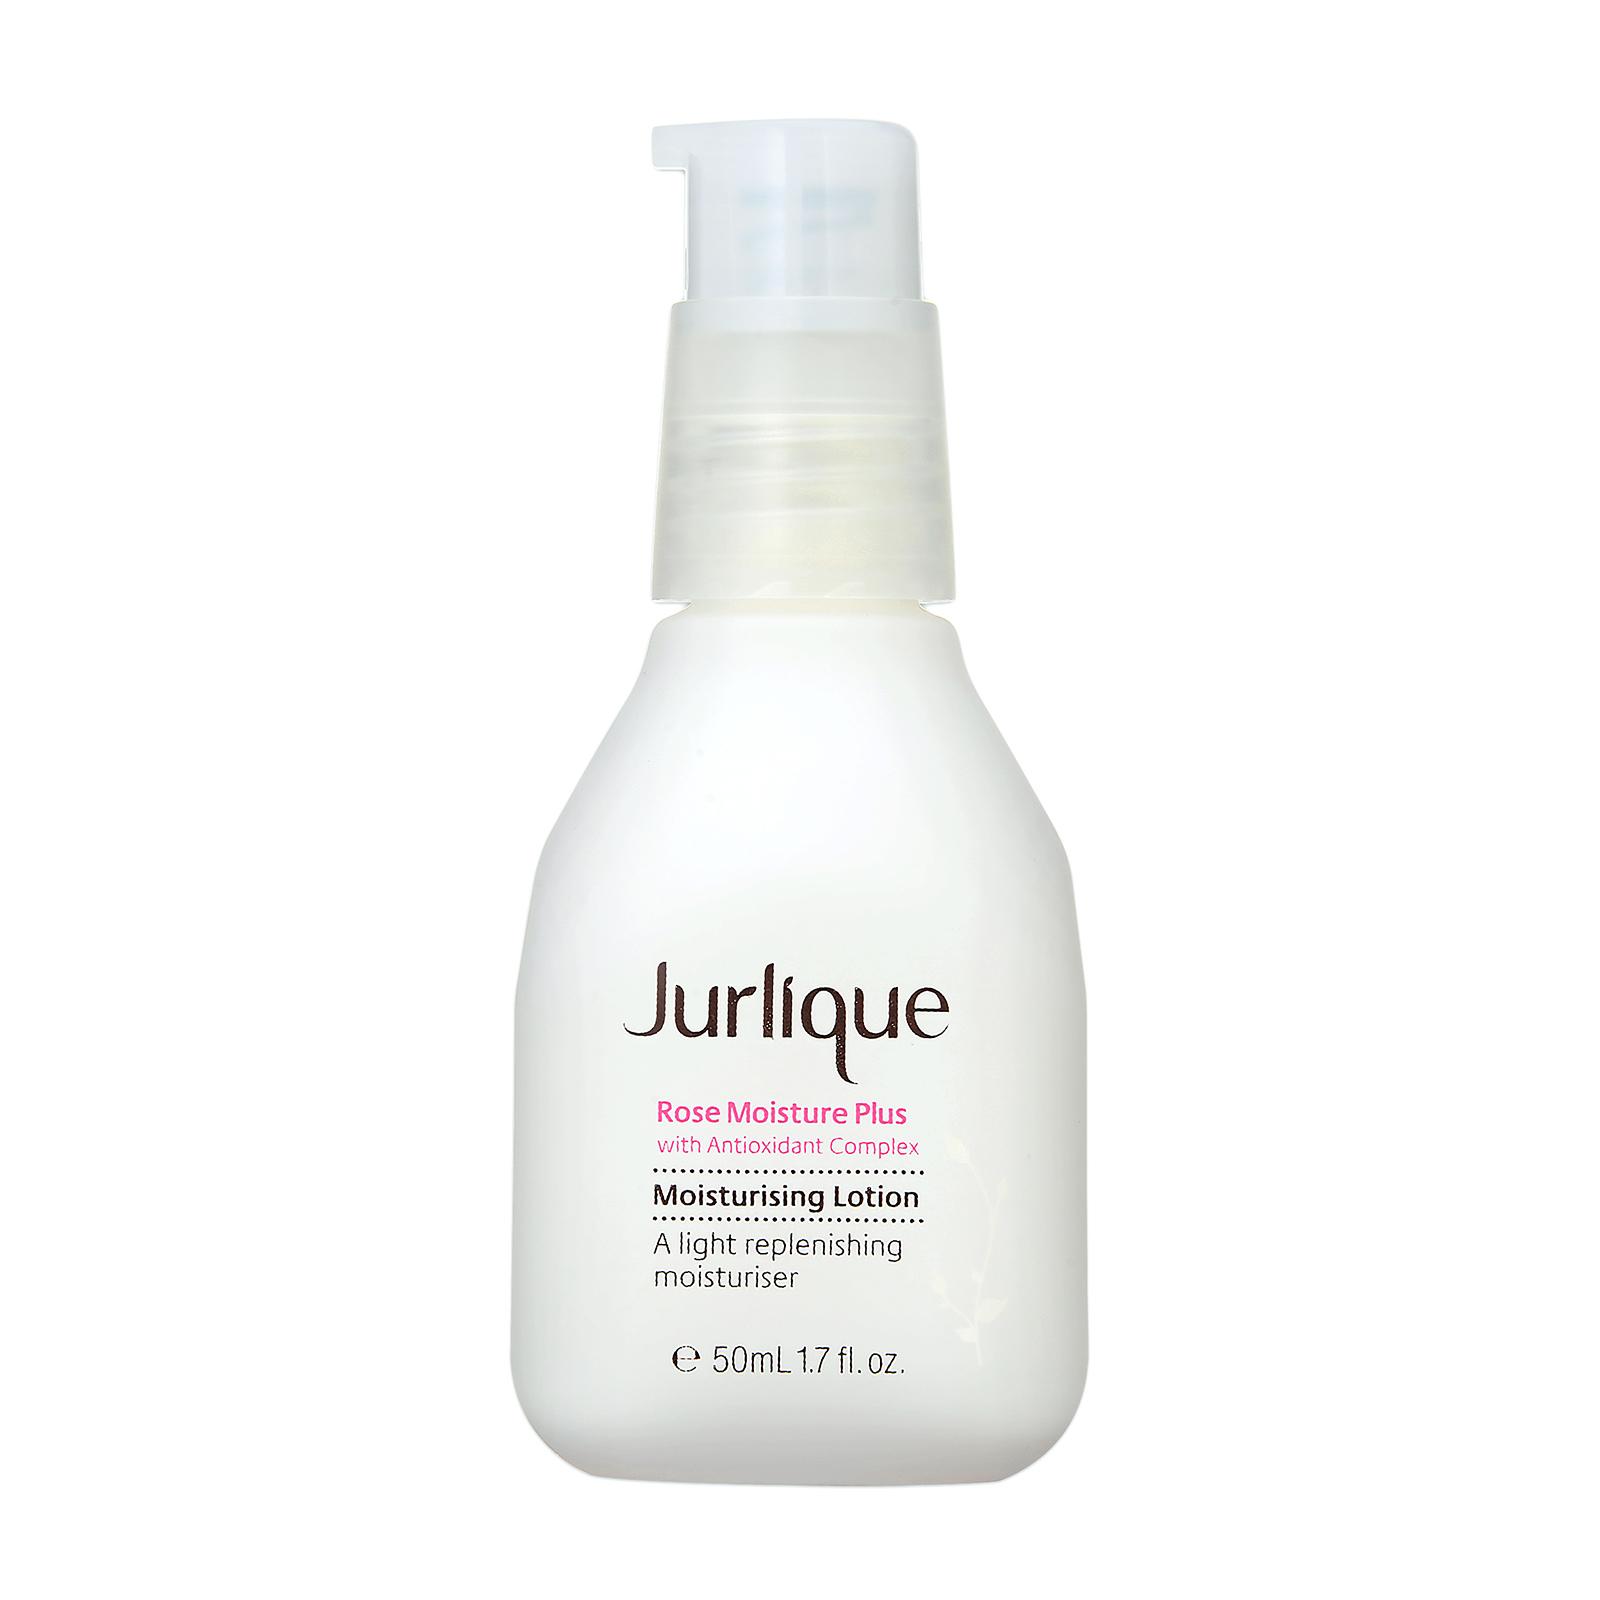 Jurlique Rose Moisture Plus  Moisturising Lotion 1.7oz, 50ml